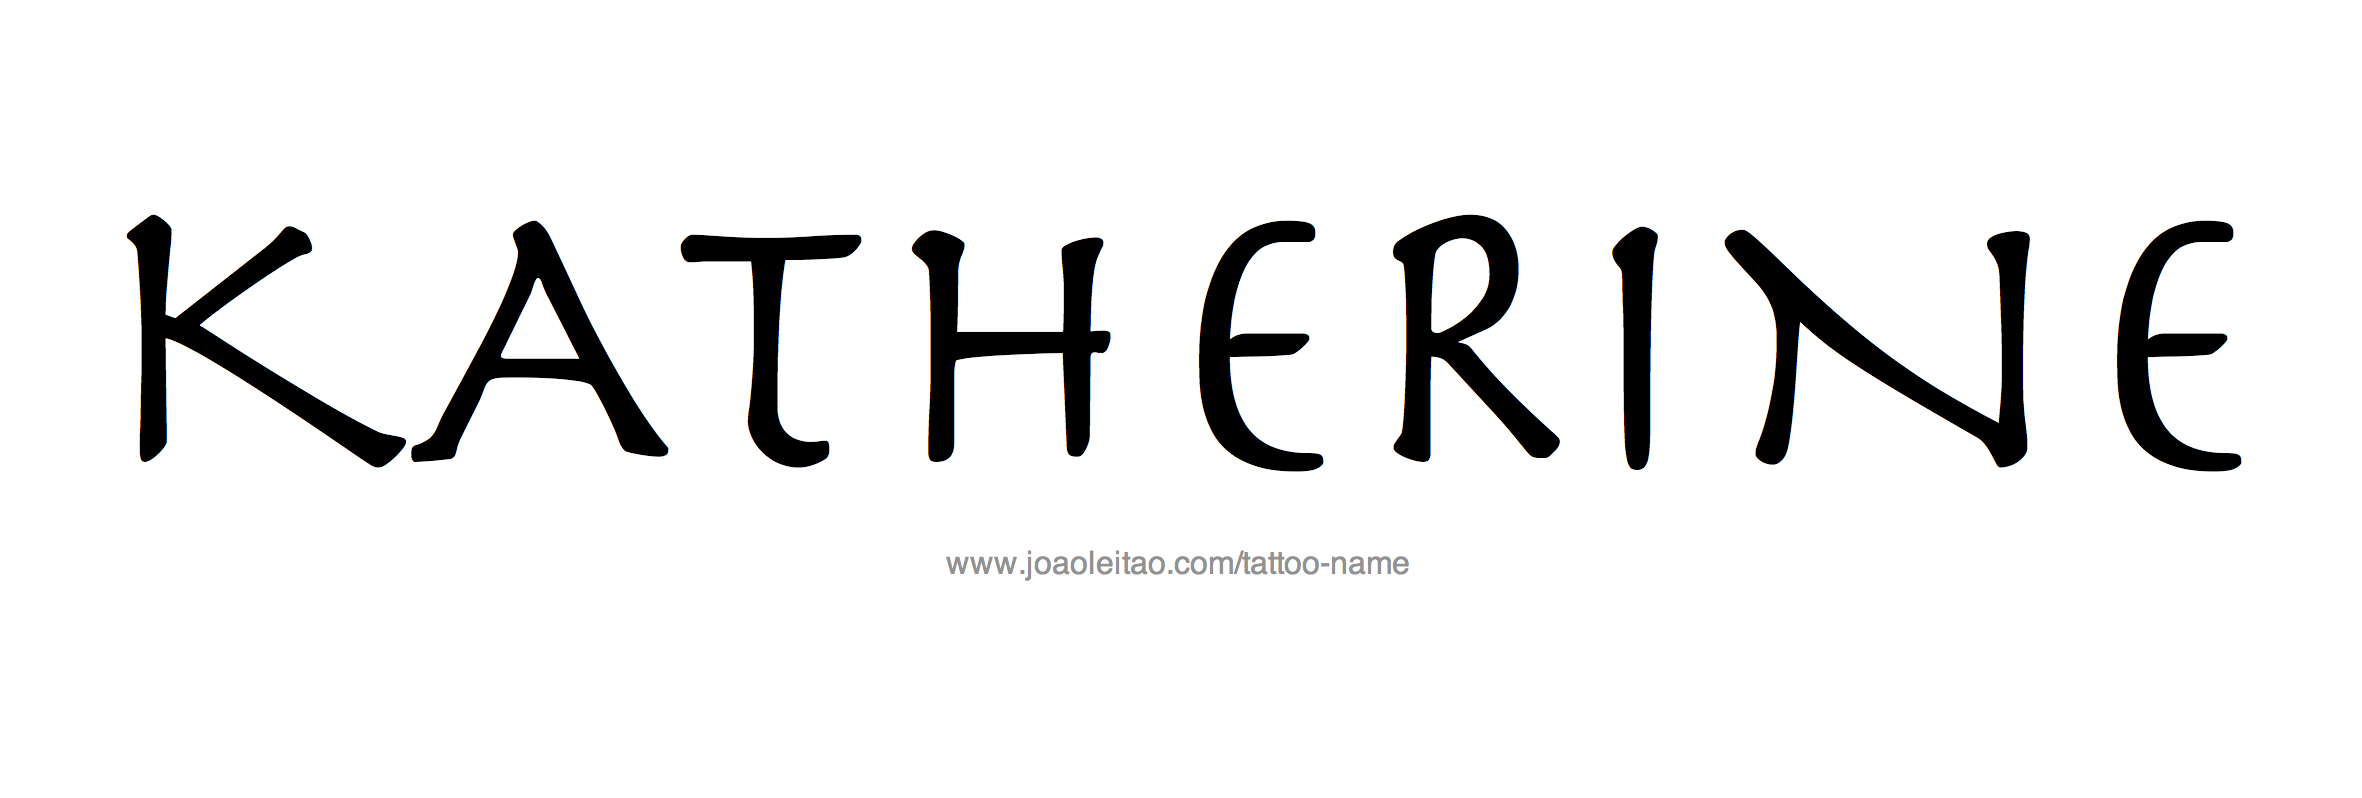 Name: Katherine Name Tattoo Designs